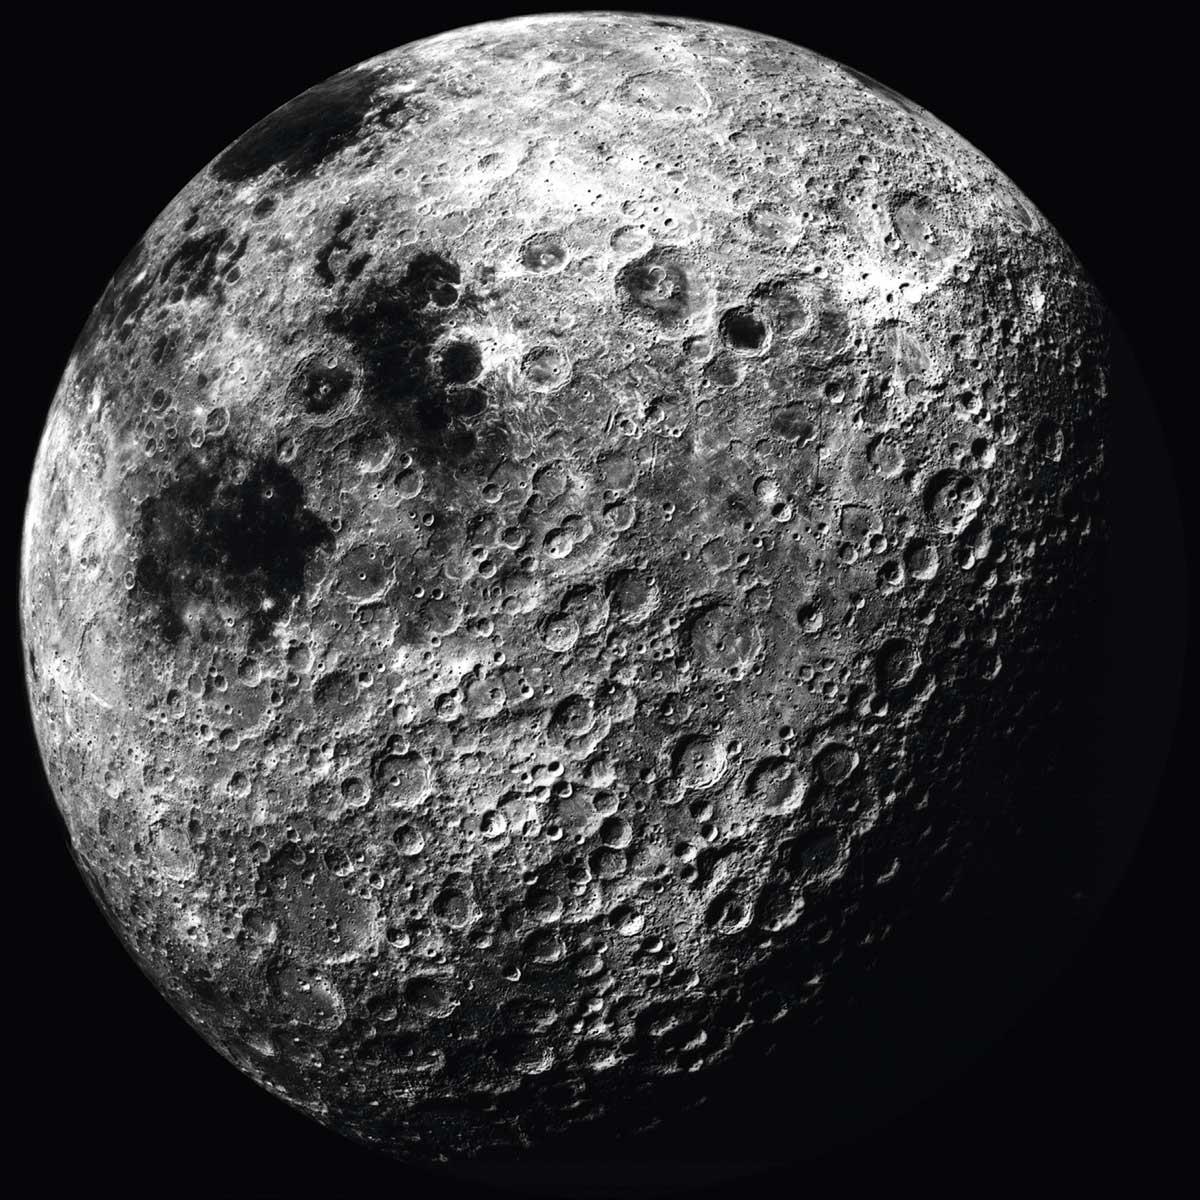 expos-lune-voyage-reel-imaginaires-grand-palais-omega-8e